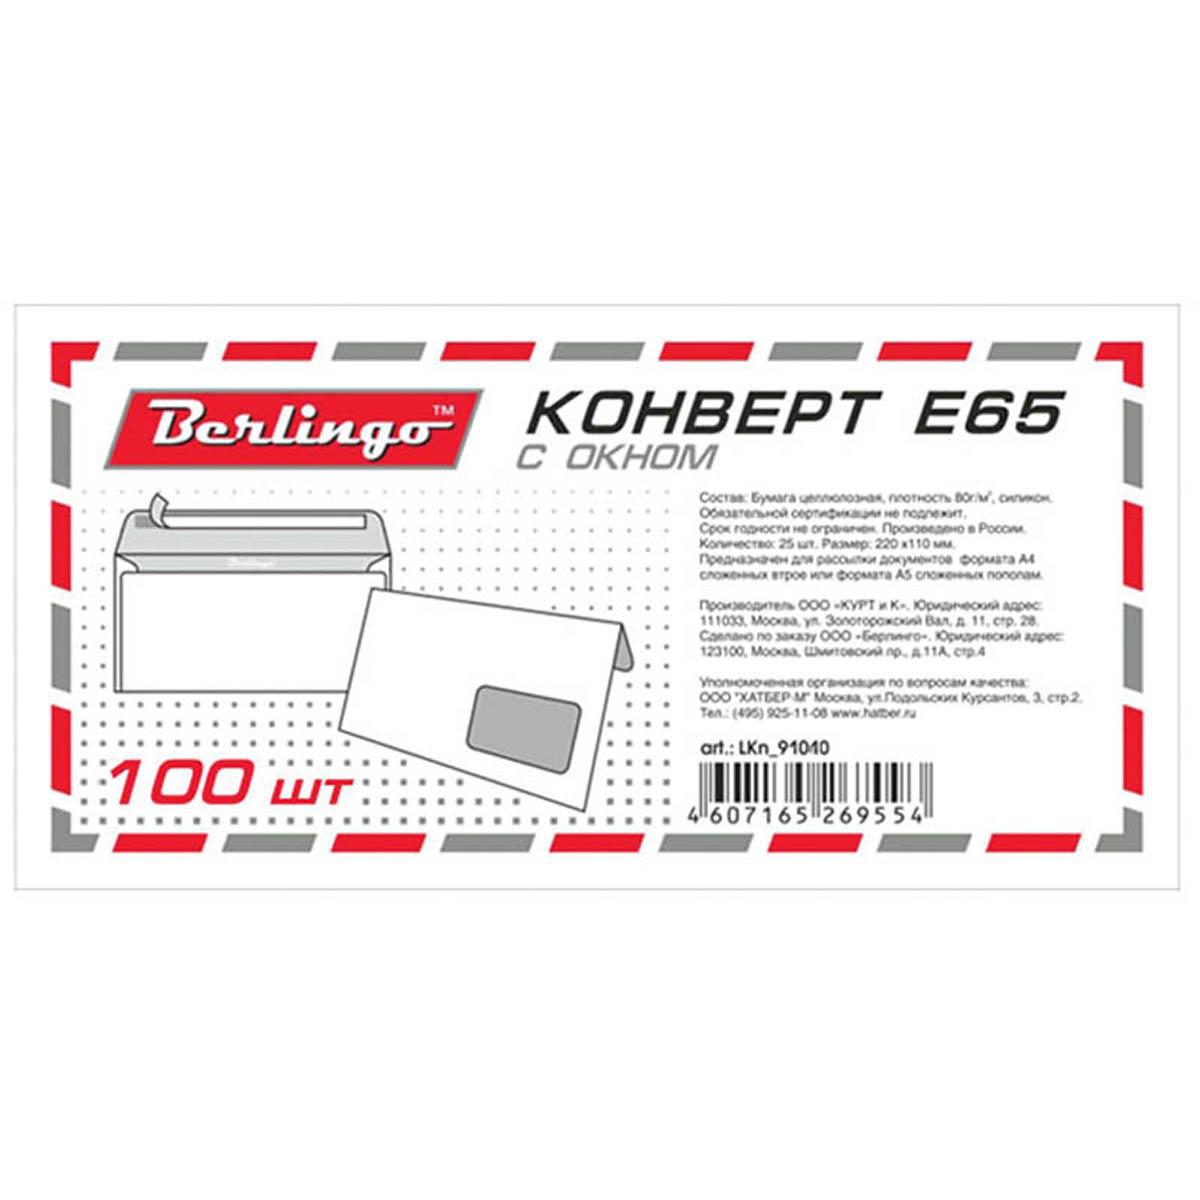 Конверт E65 100 шт LKn_91010, Berlingo